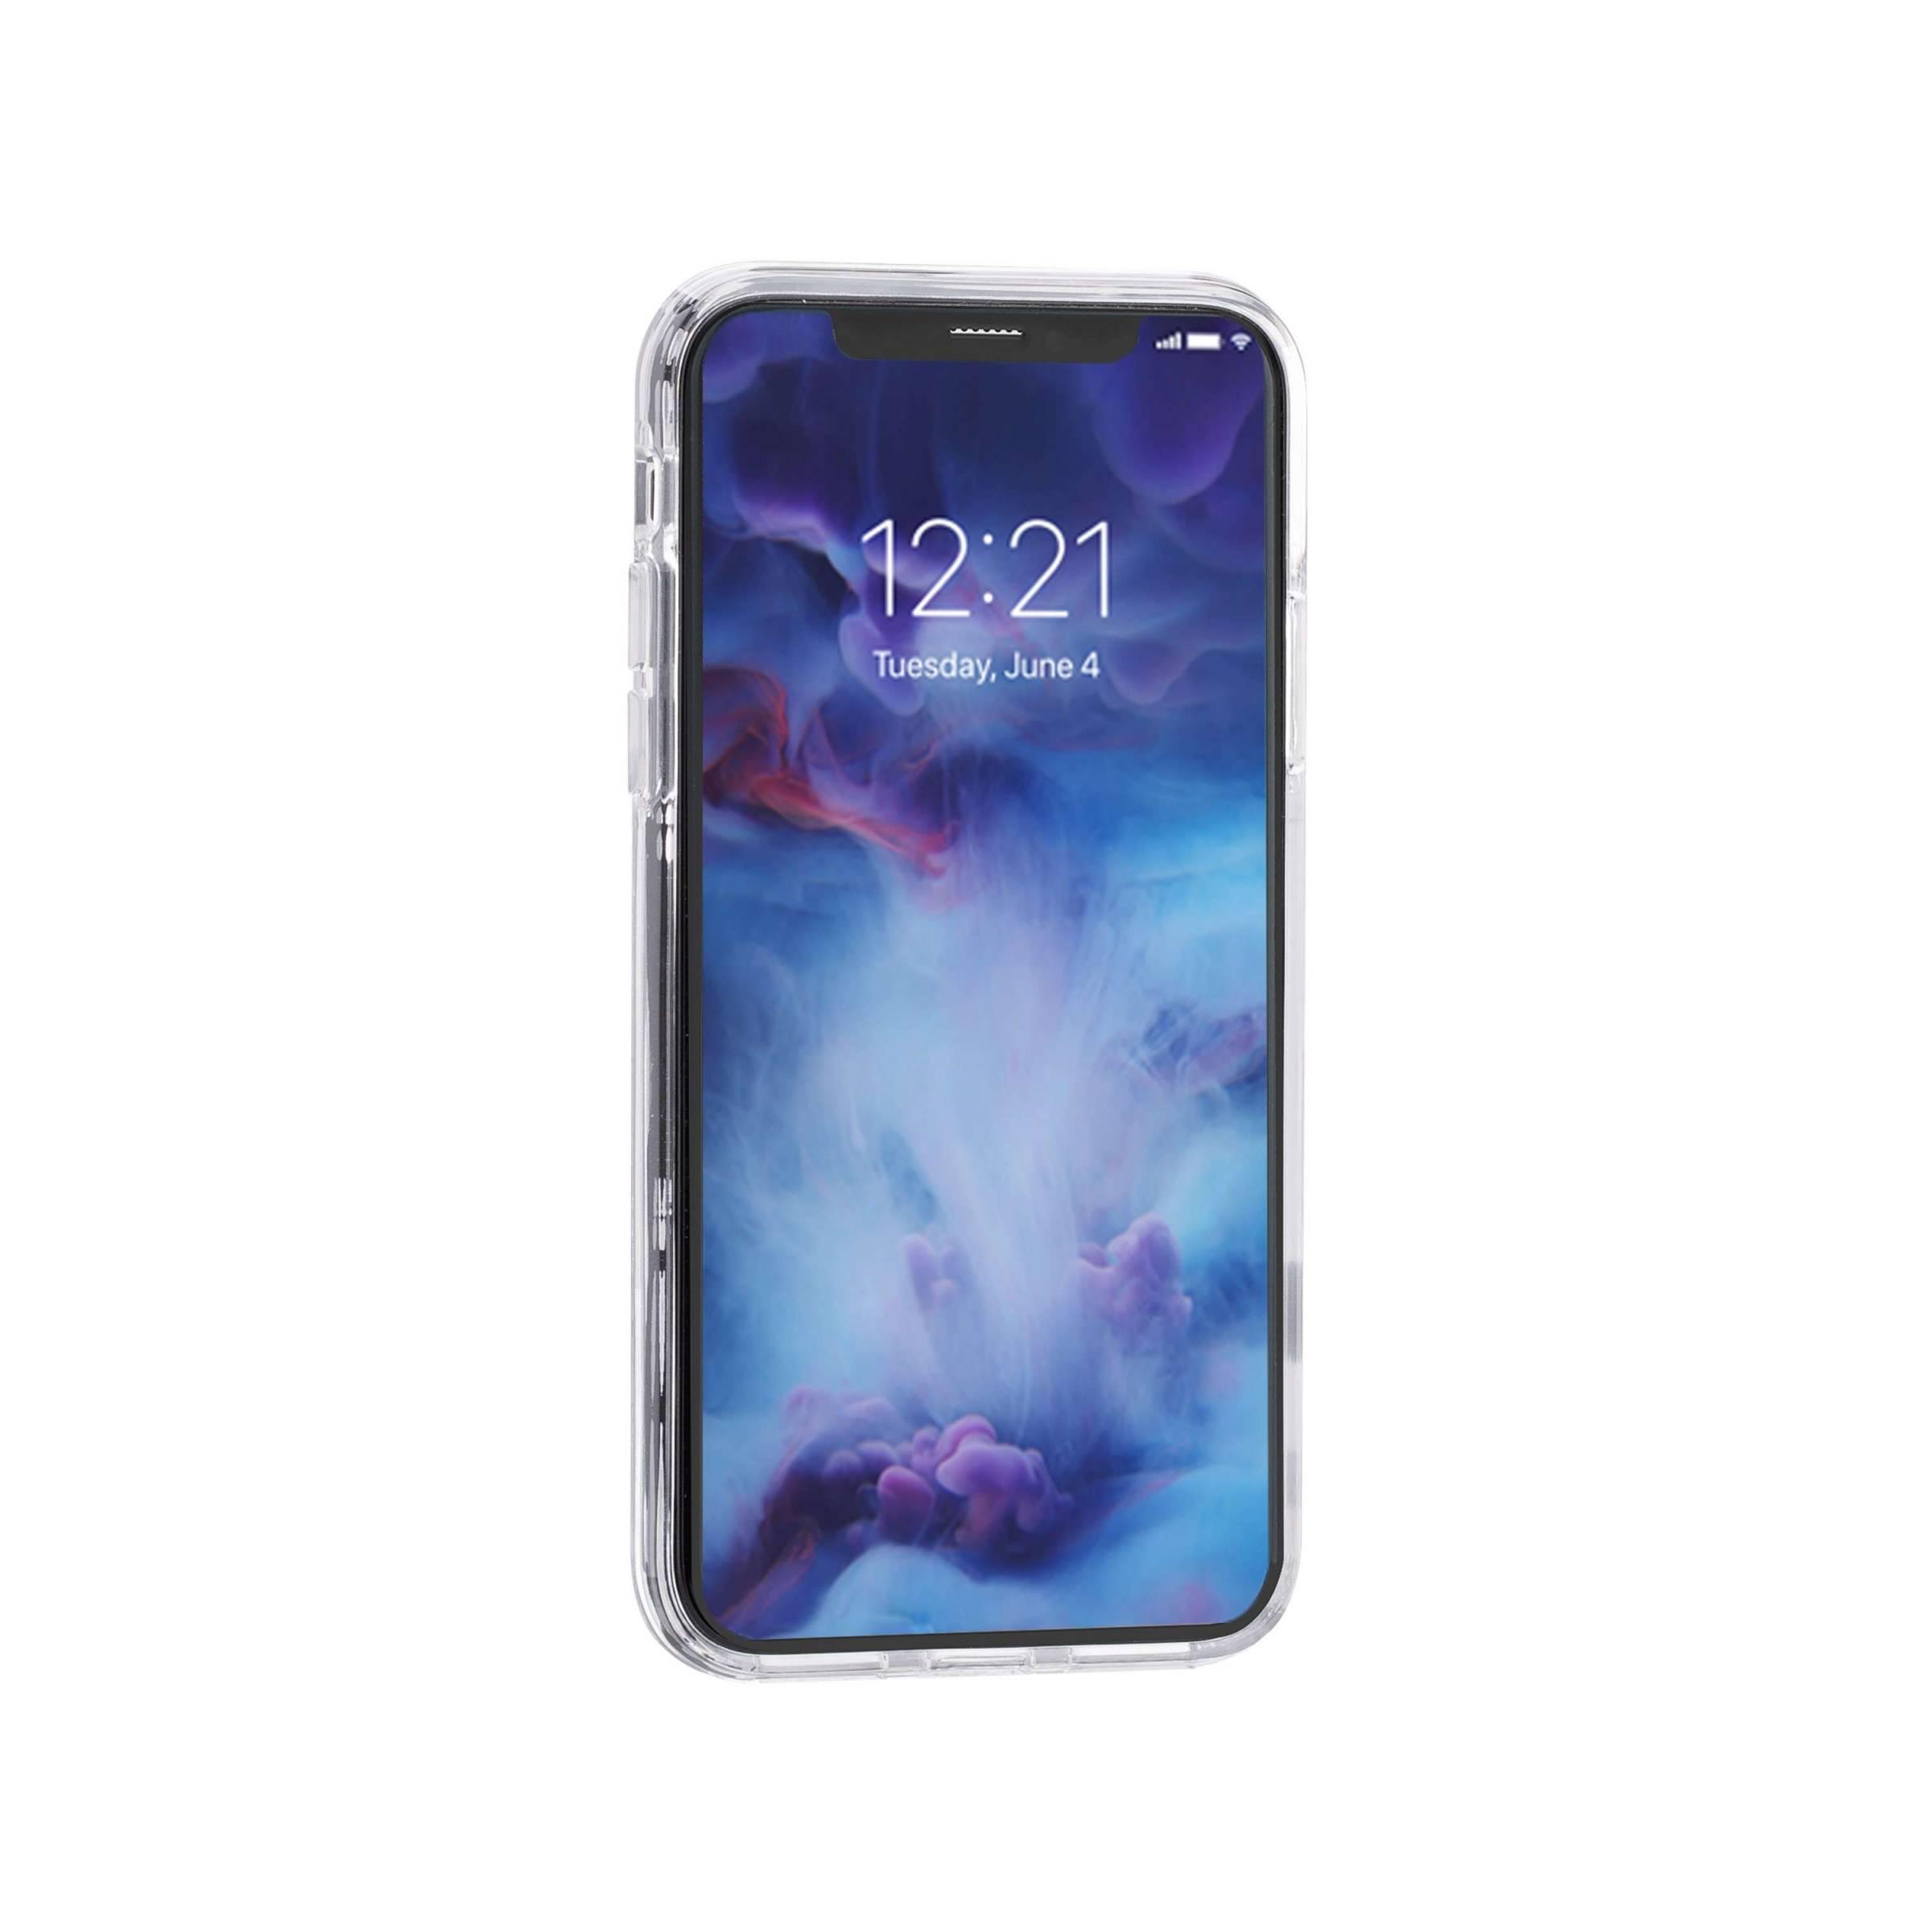 Bilde av 3sixt Iphone 11 Pro Pure Flex 2.0 Case